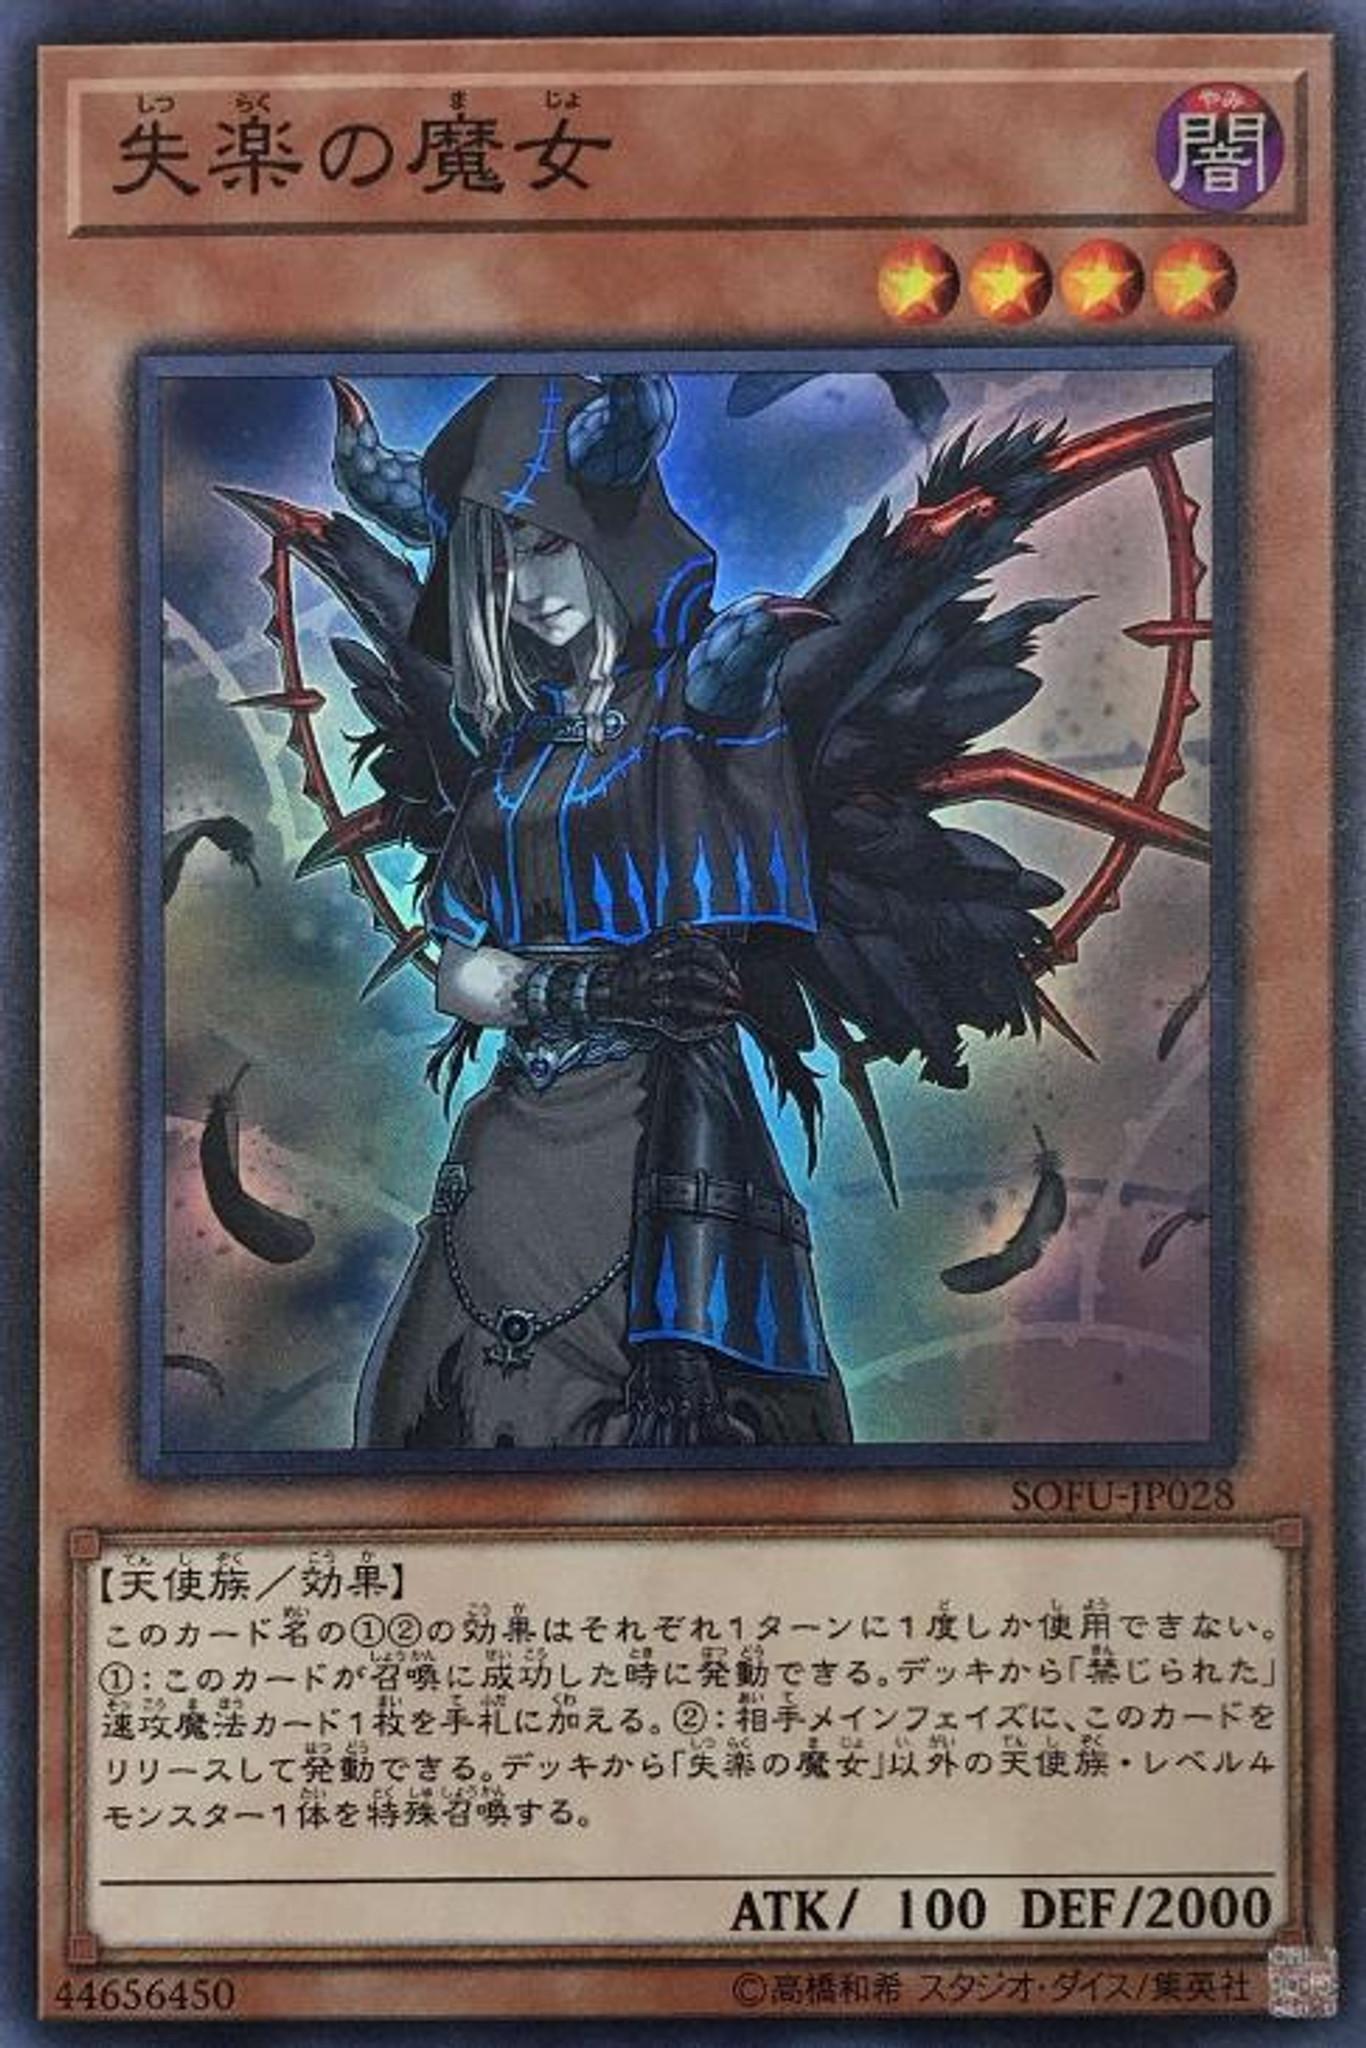 Witchcrafter Golem Aruru RIRA-JP028 20th Secret Japan Yu-Gi-Oh!